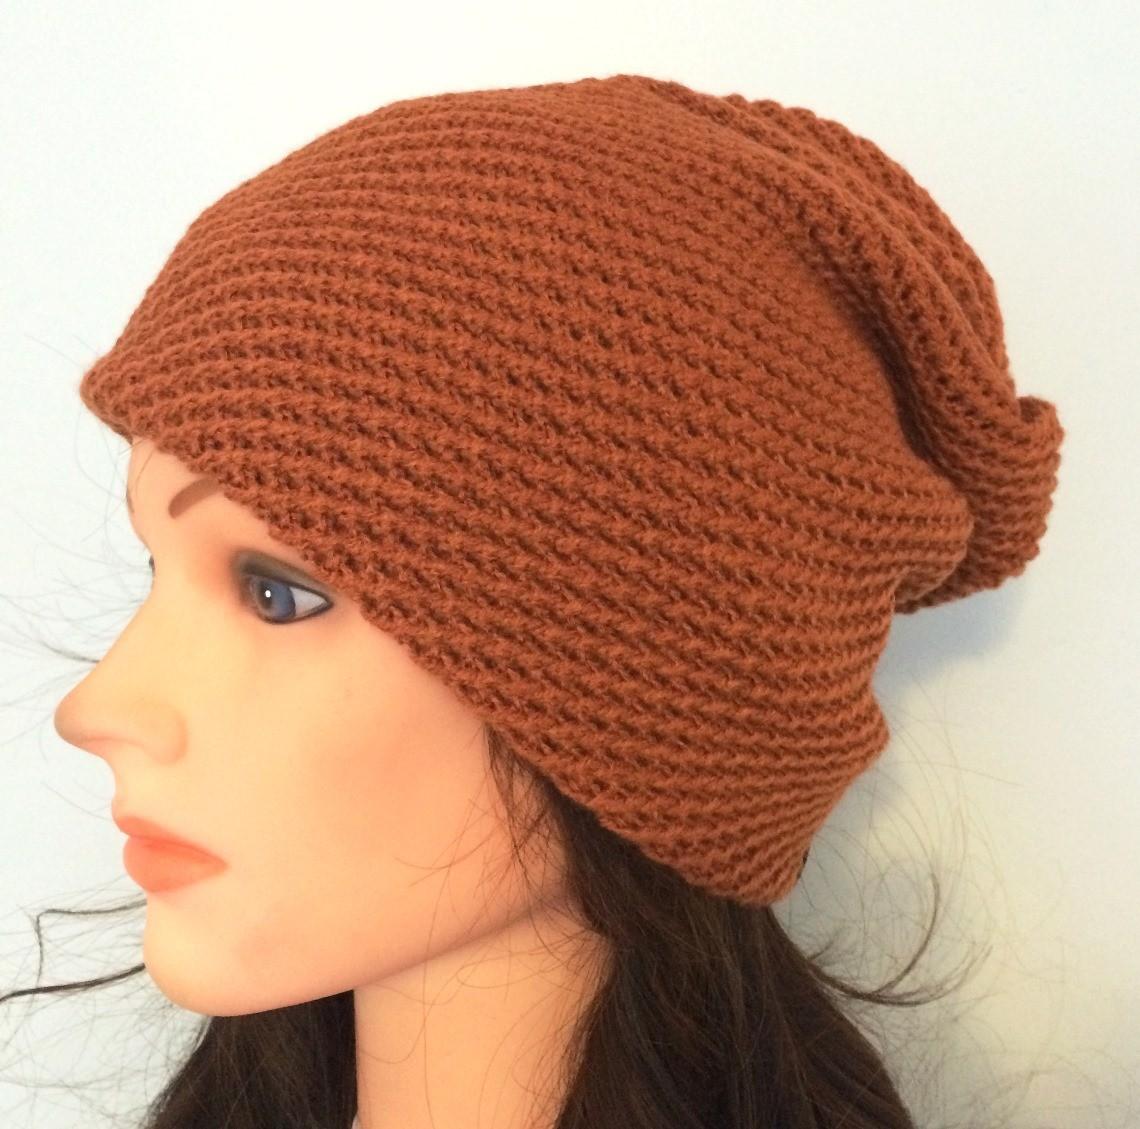 Burnt orange slouchy hat/beret